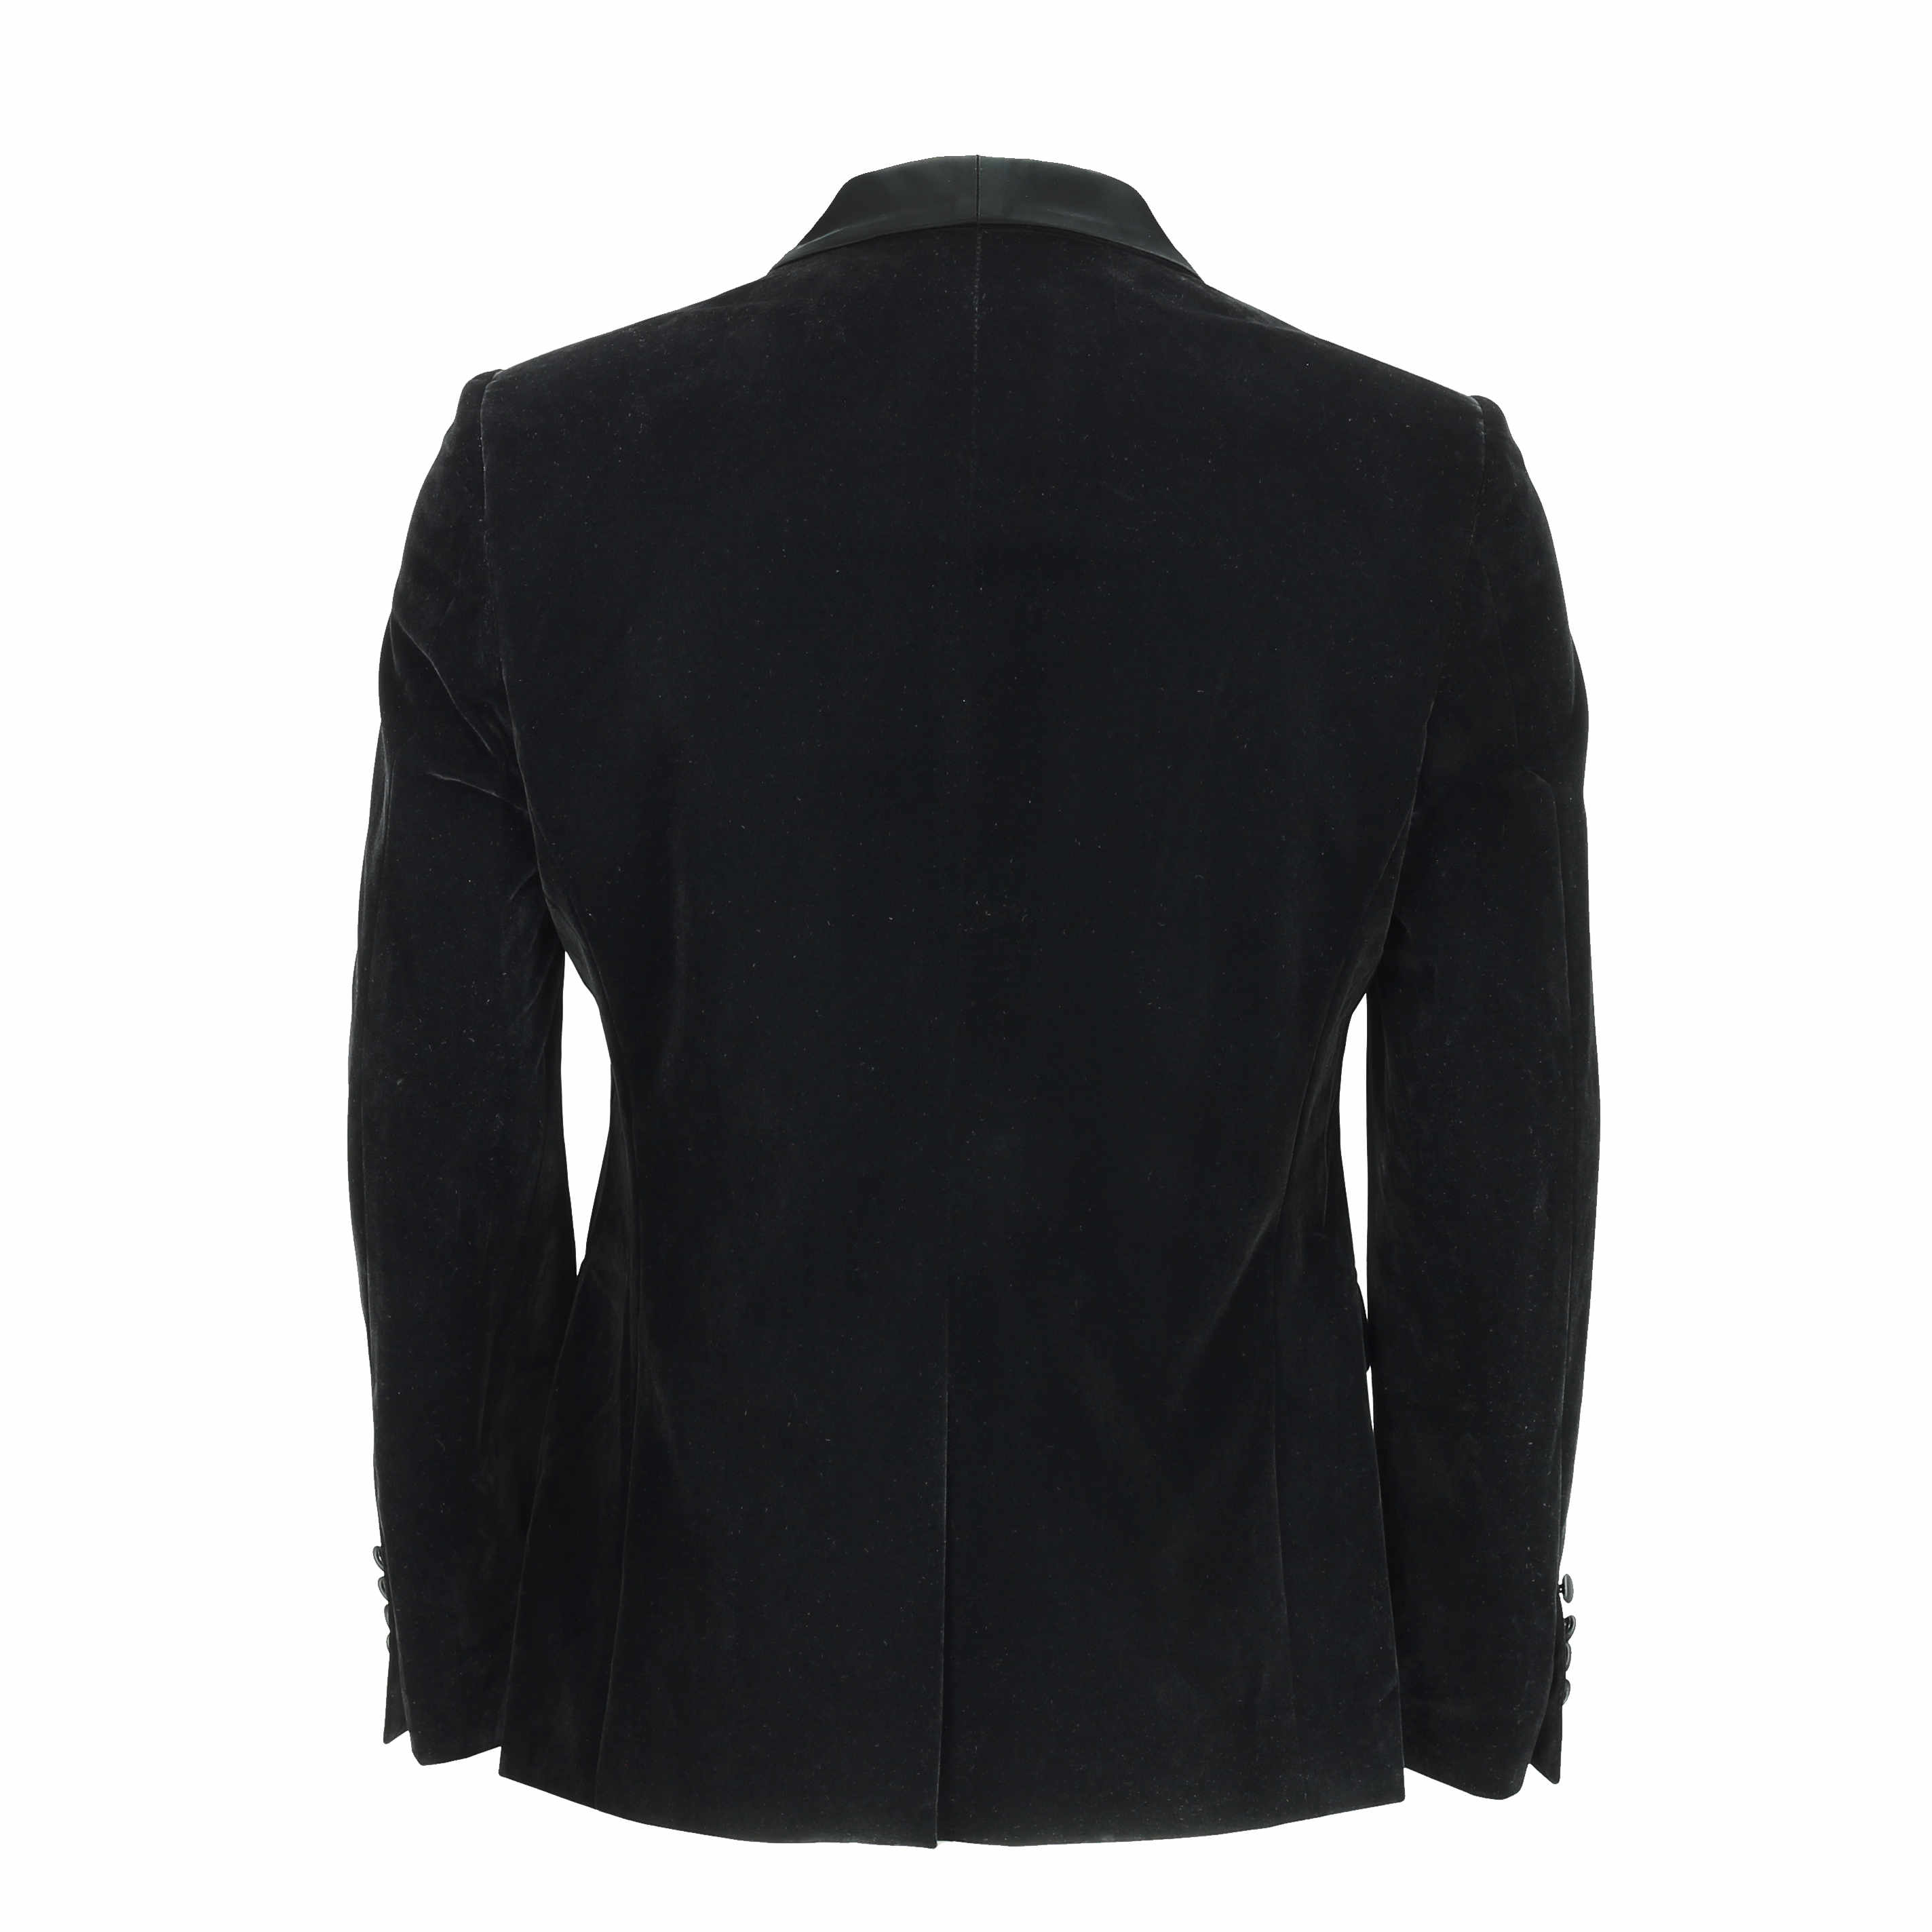 Para-hombre-negro-terciopelo-vintage-3-Piezas-Traje-Blazer-Chaleco-del-pantalon-se-vende-por miniatura 12